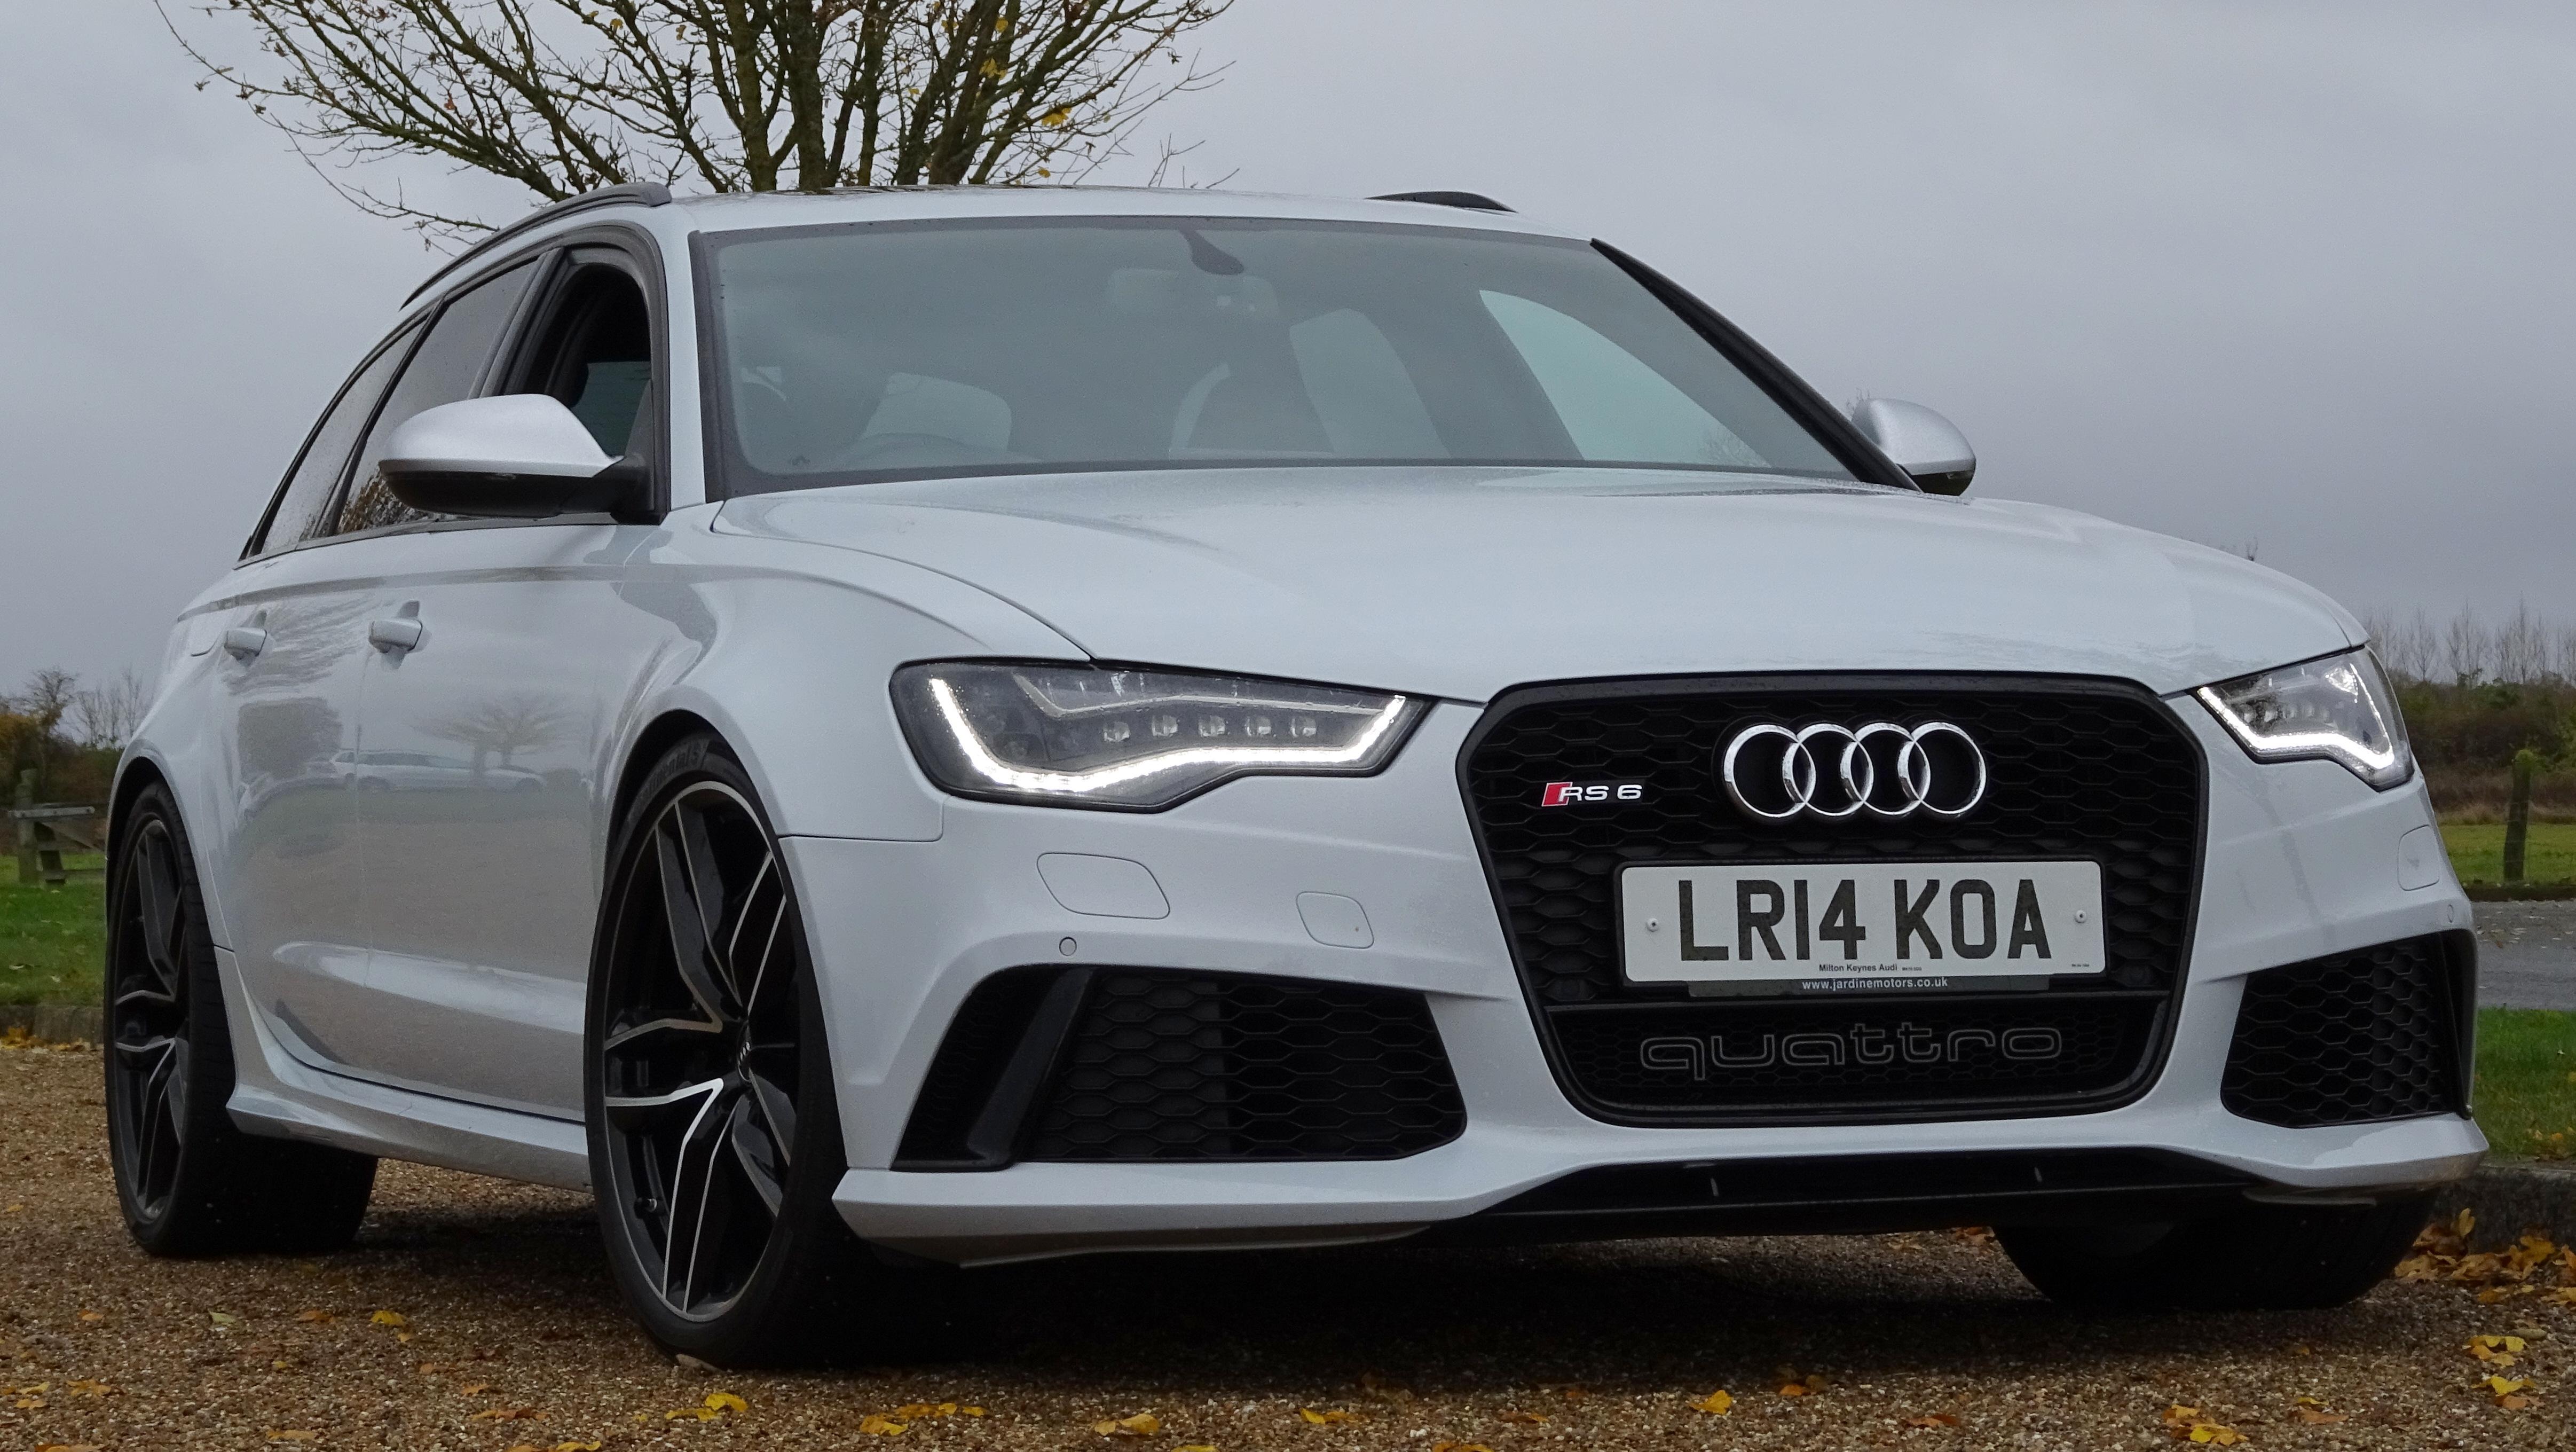 2014 Audi RS6 Video Walk Around